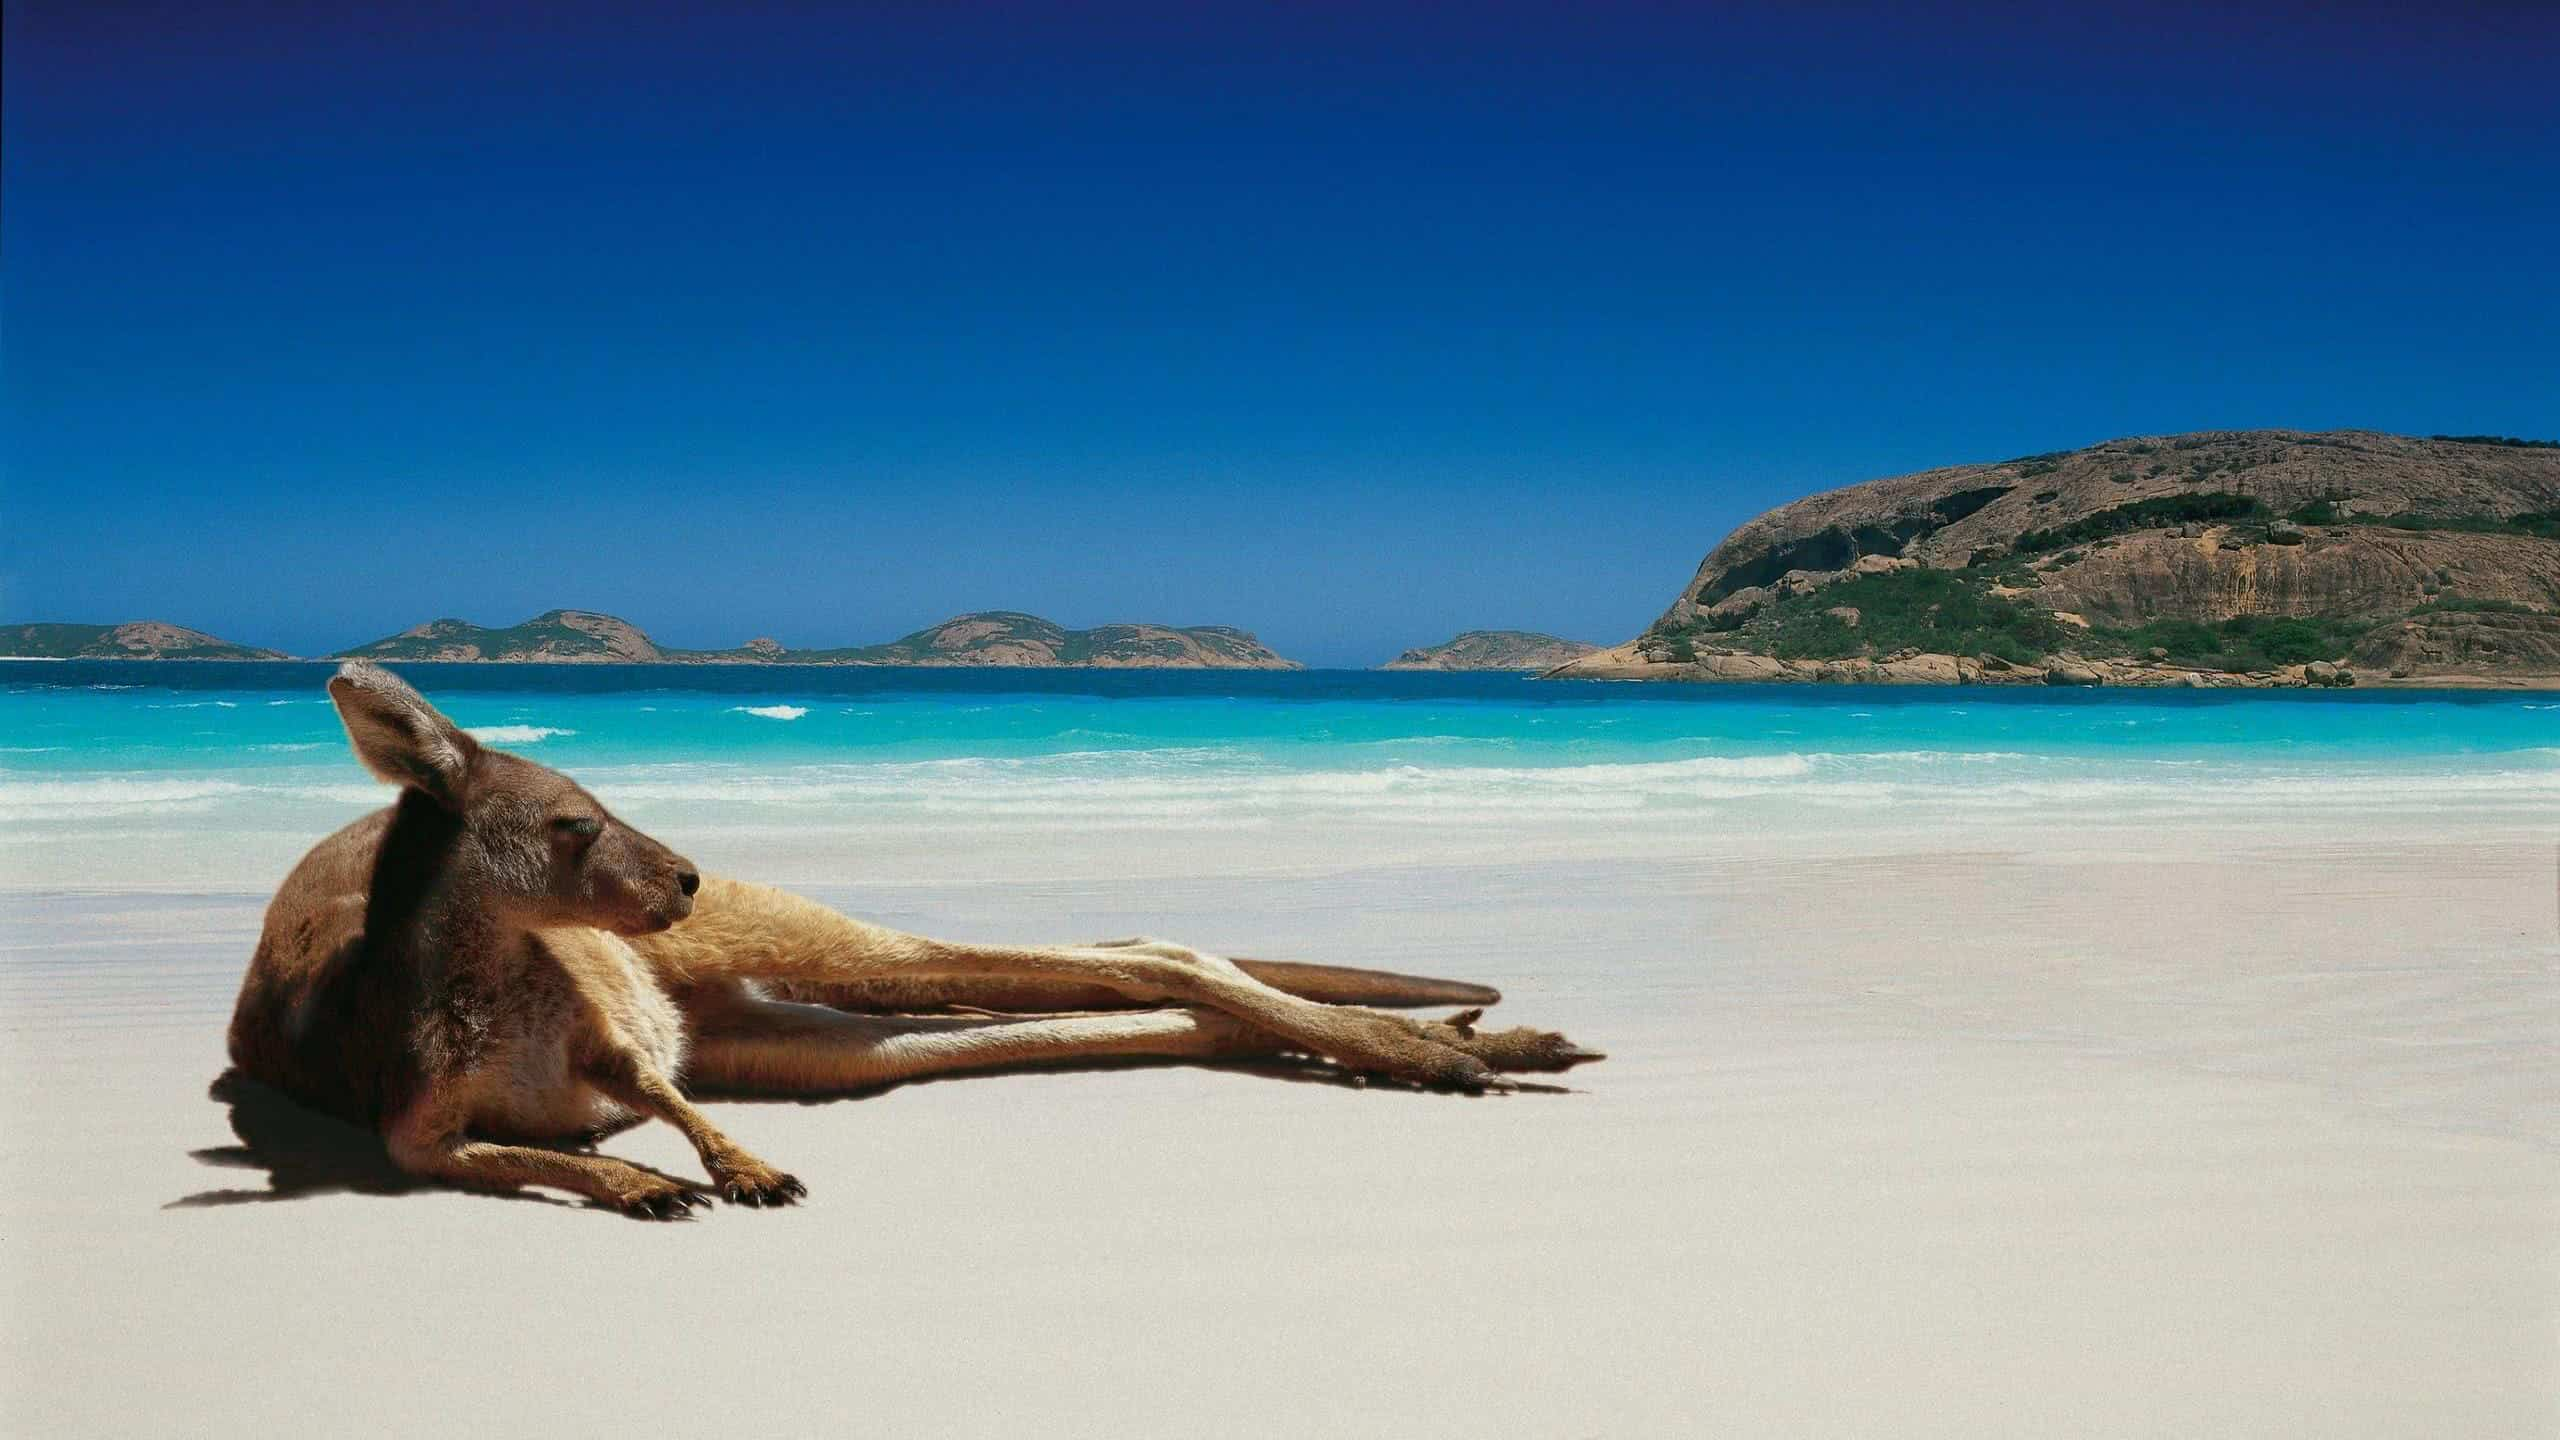 kangaroo cape le grand national park australia wqhd 1440p wallpaper